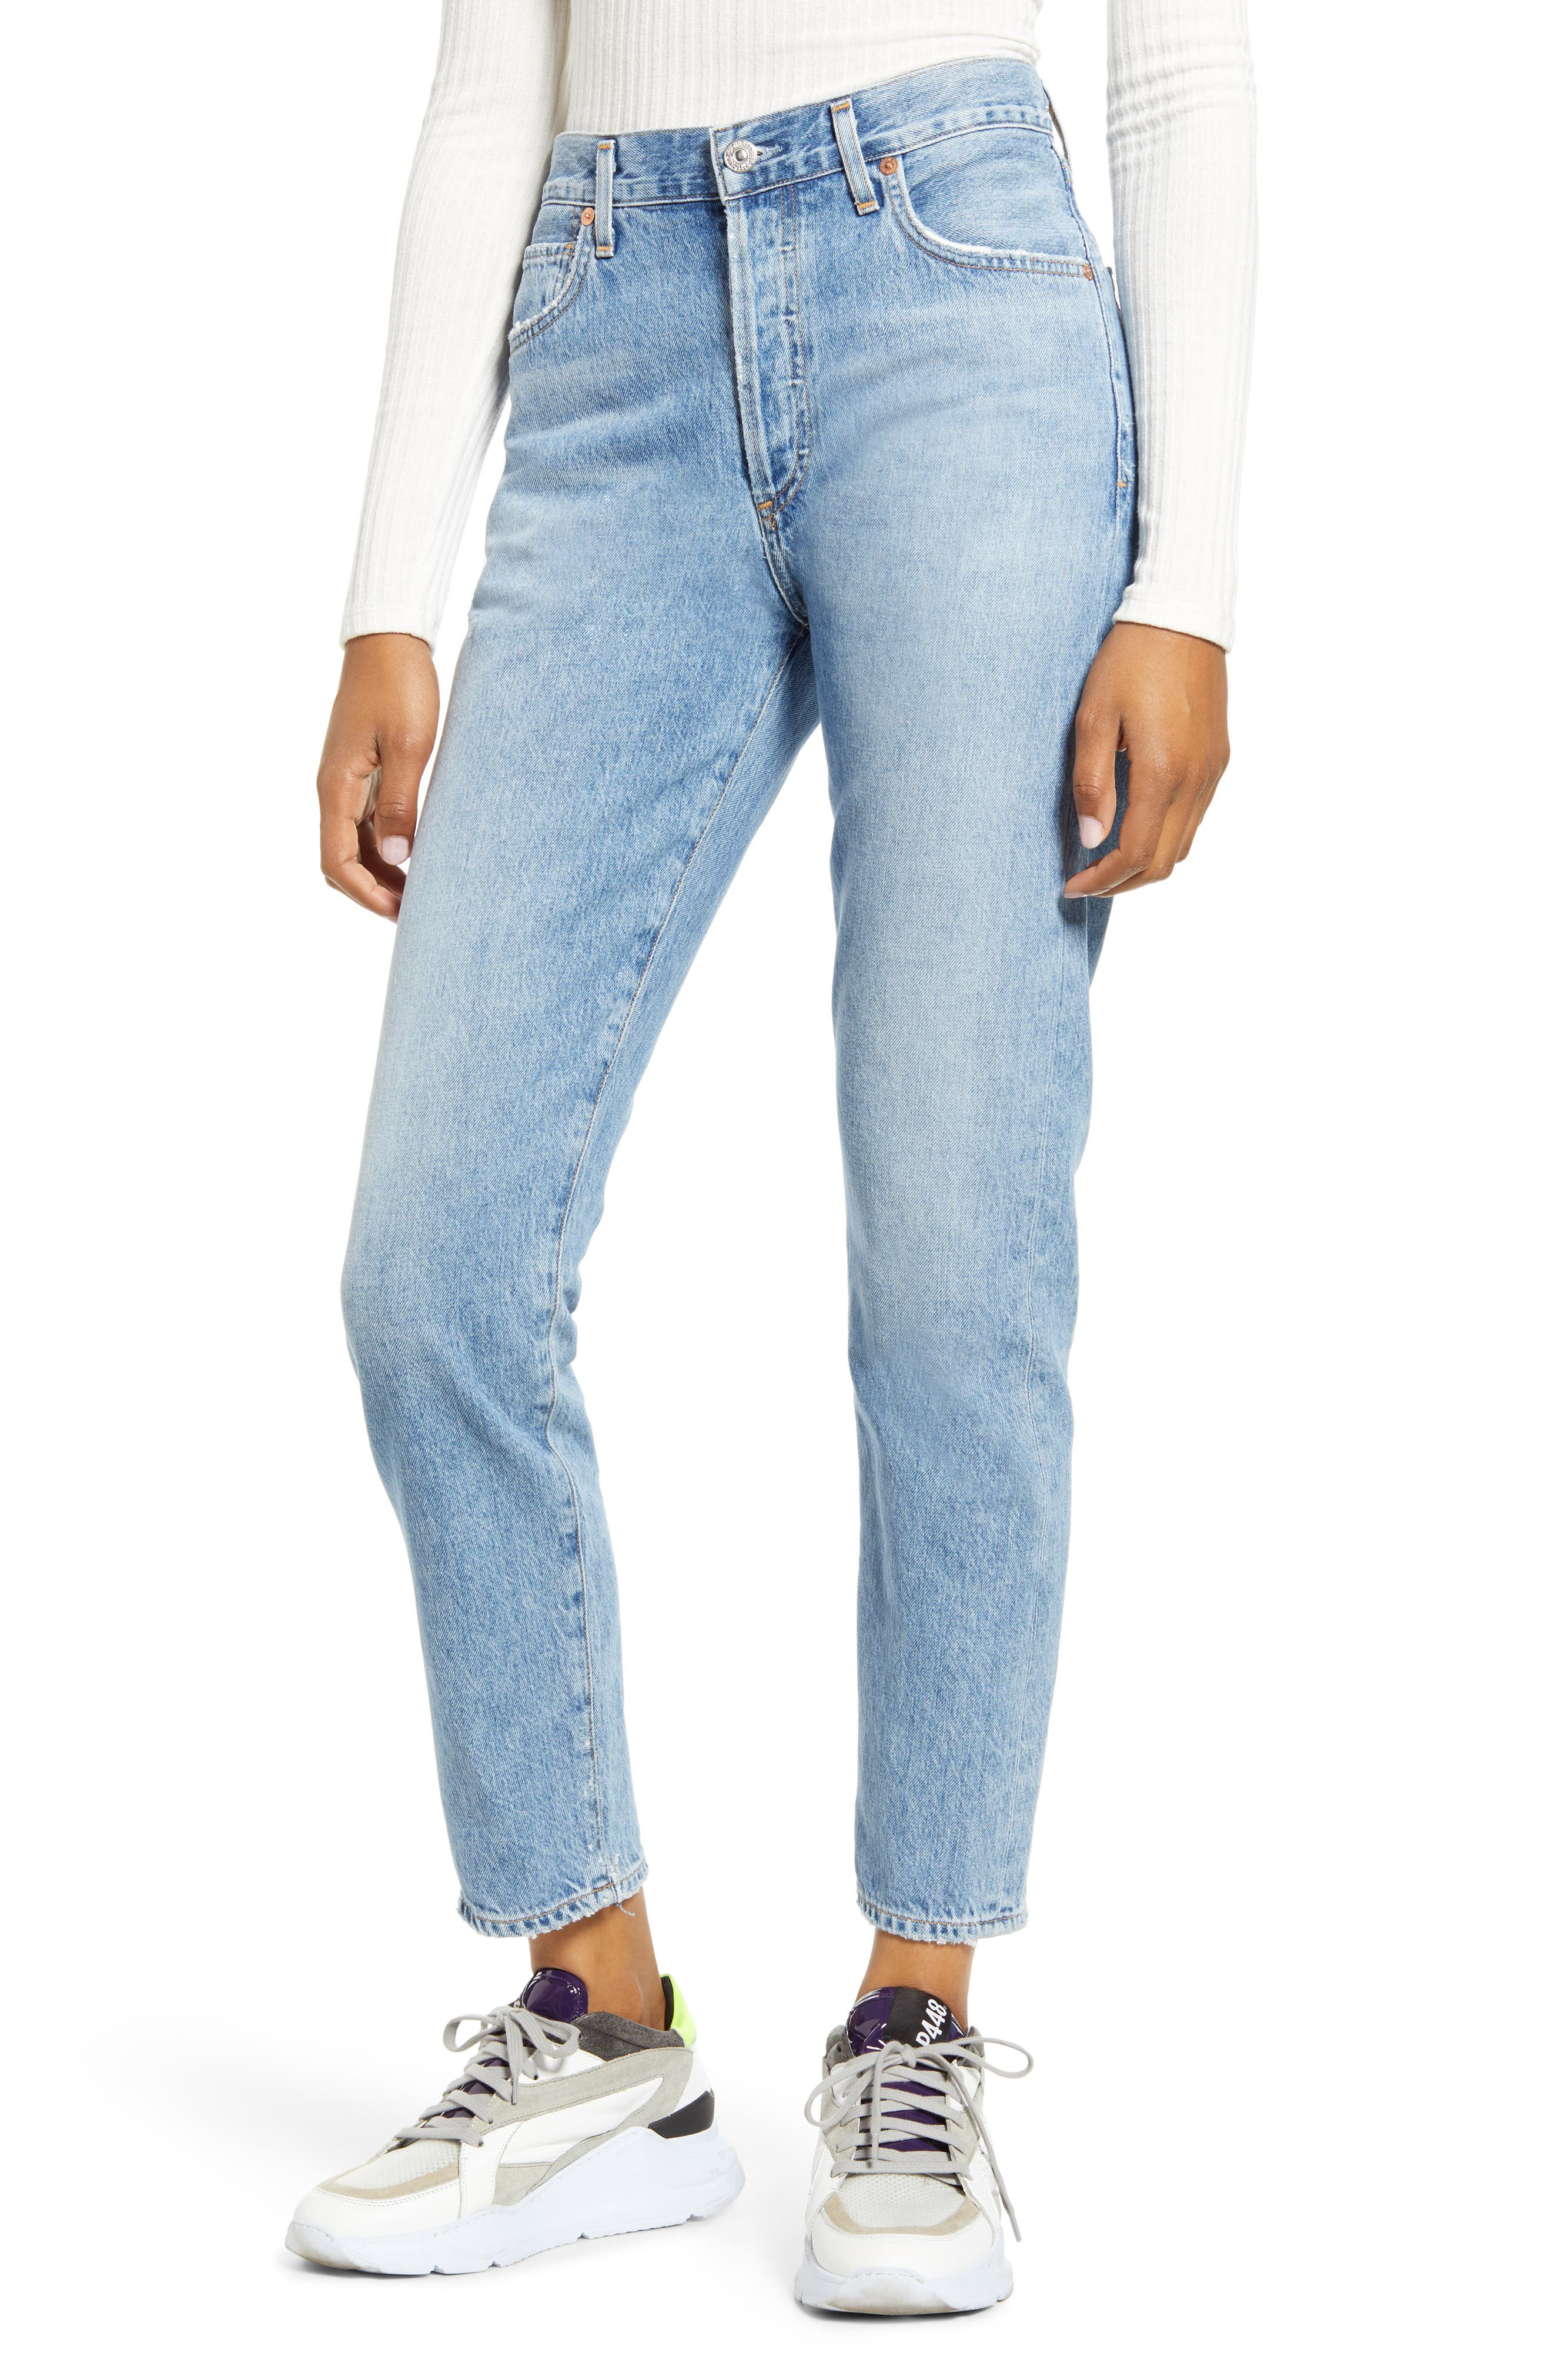 Citizens of Humanity Liya High Waist Nonstretch Organic Cotton Boyfriend Jeans (Soundtrack)